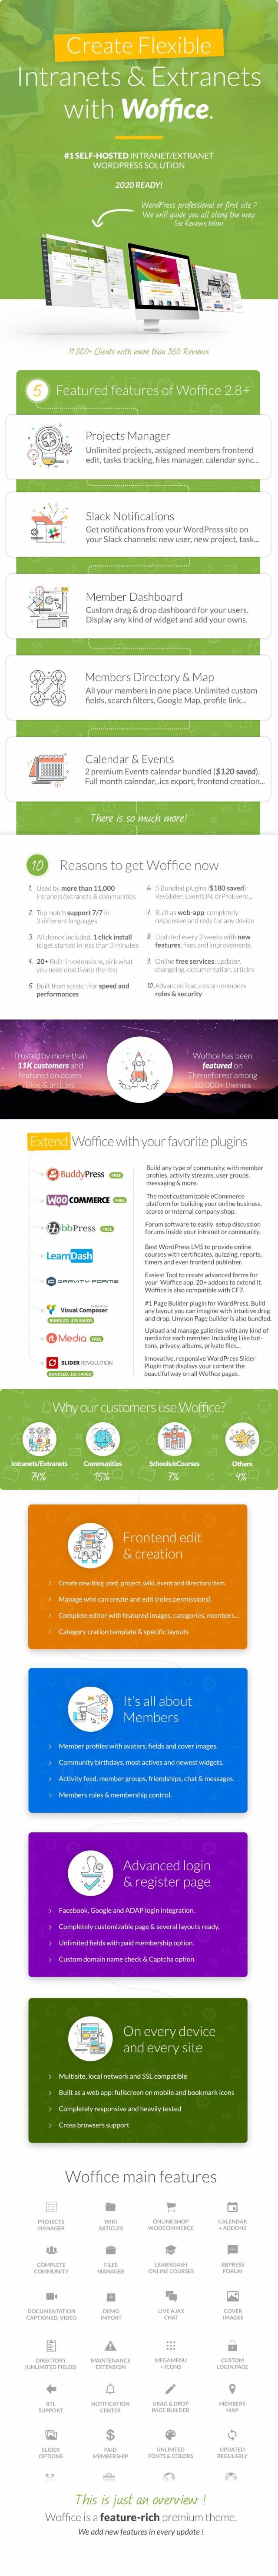 Woffice - Intranet/Extranet WordPress Theme - 1